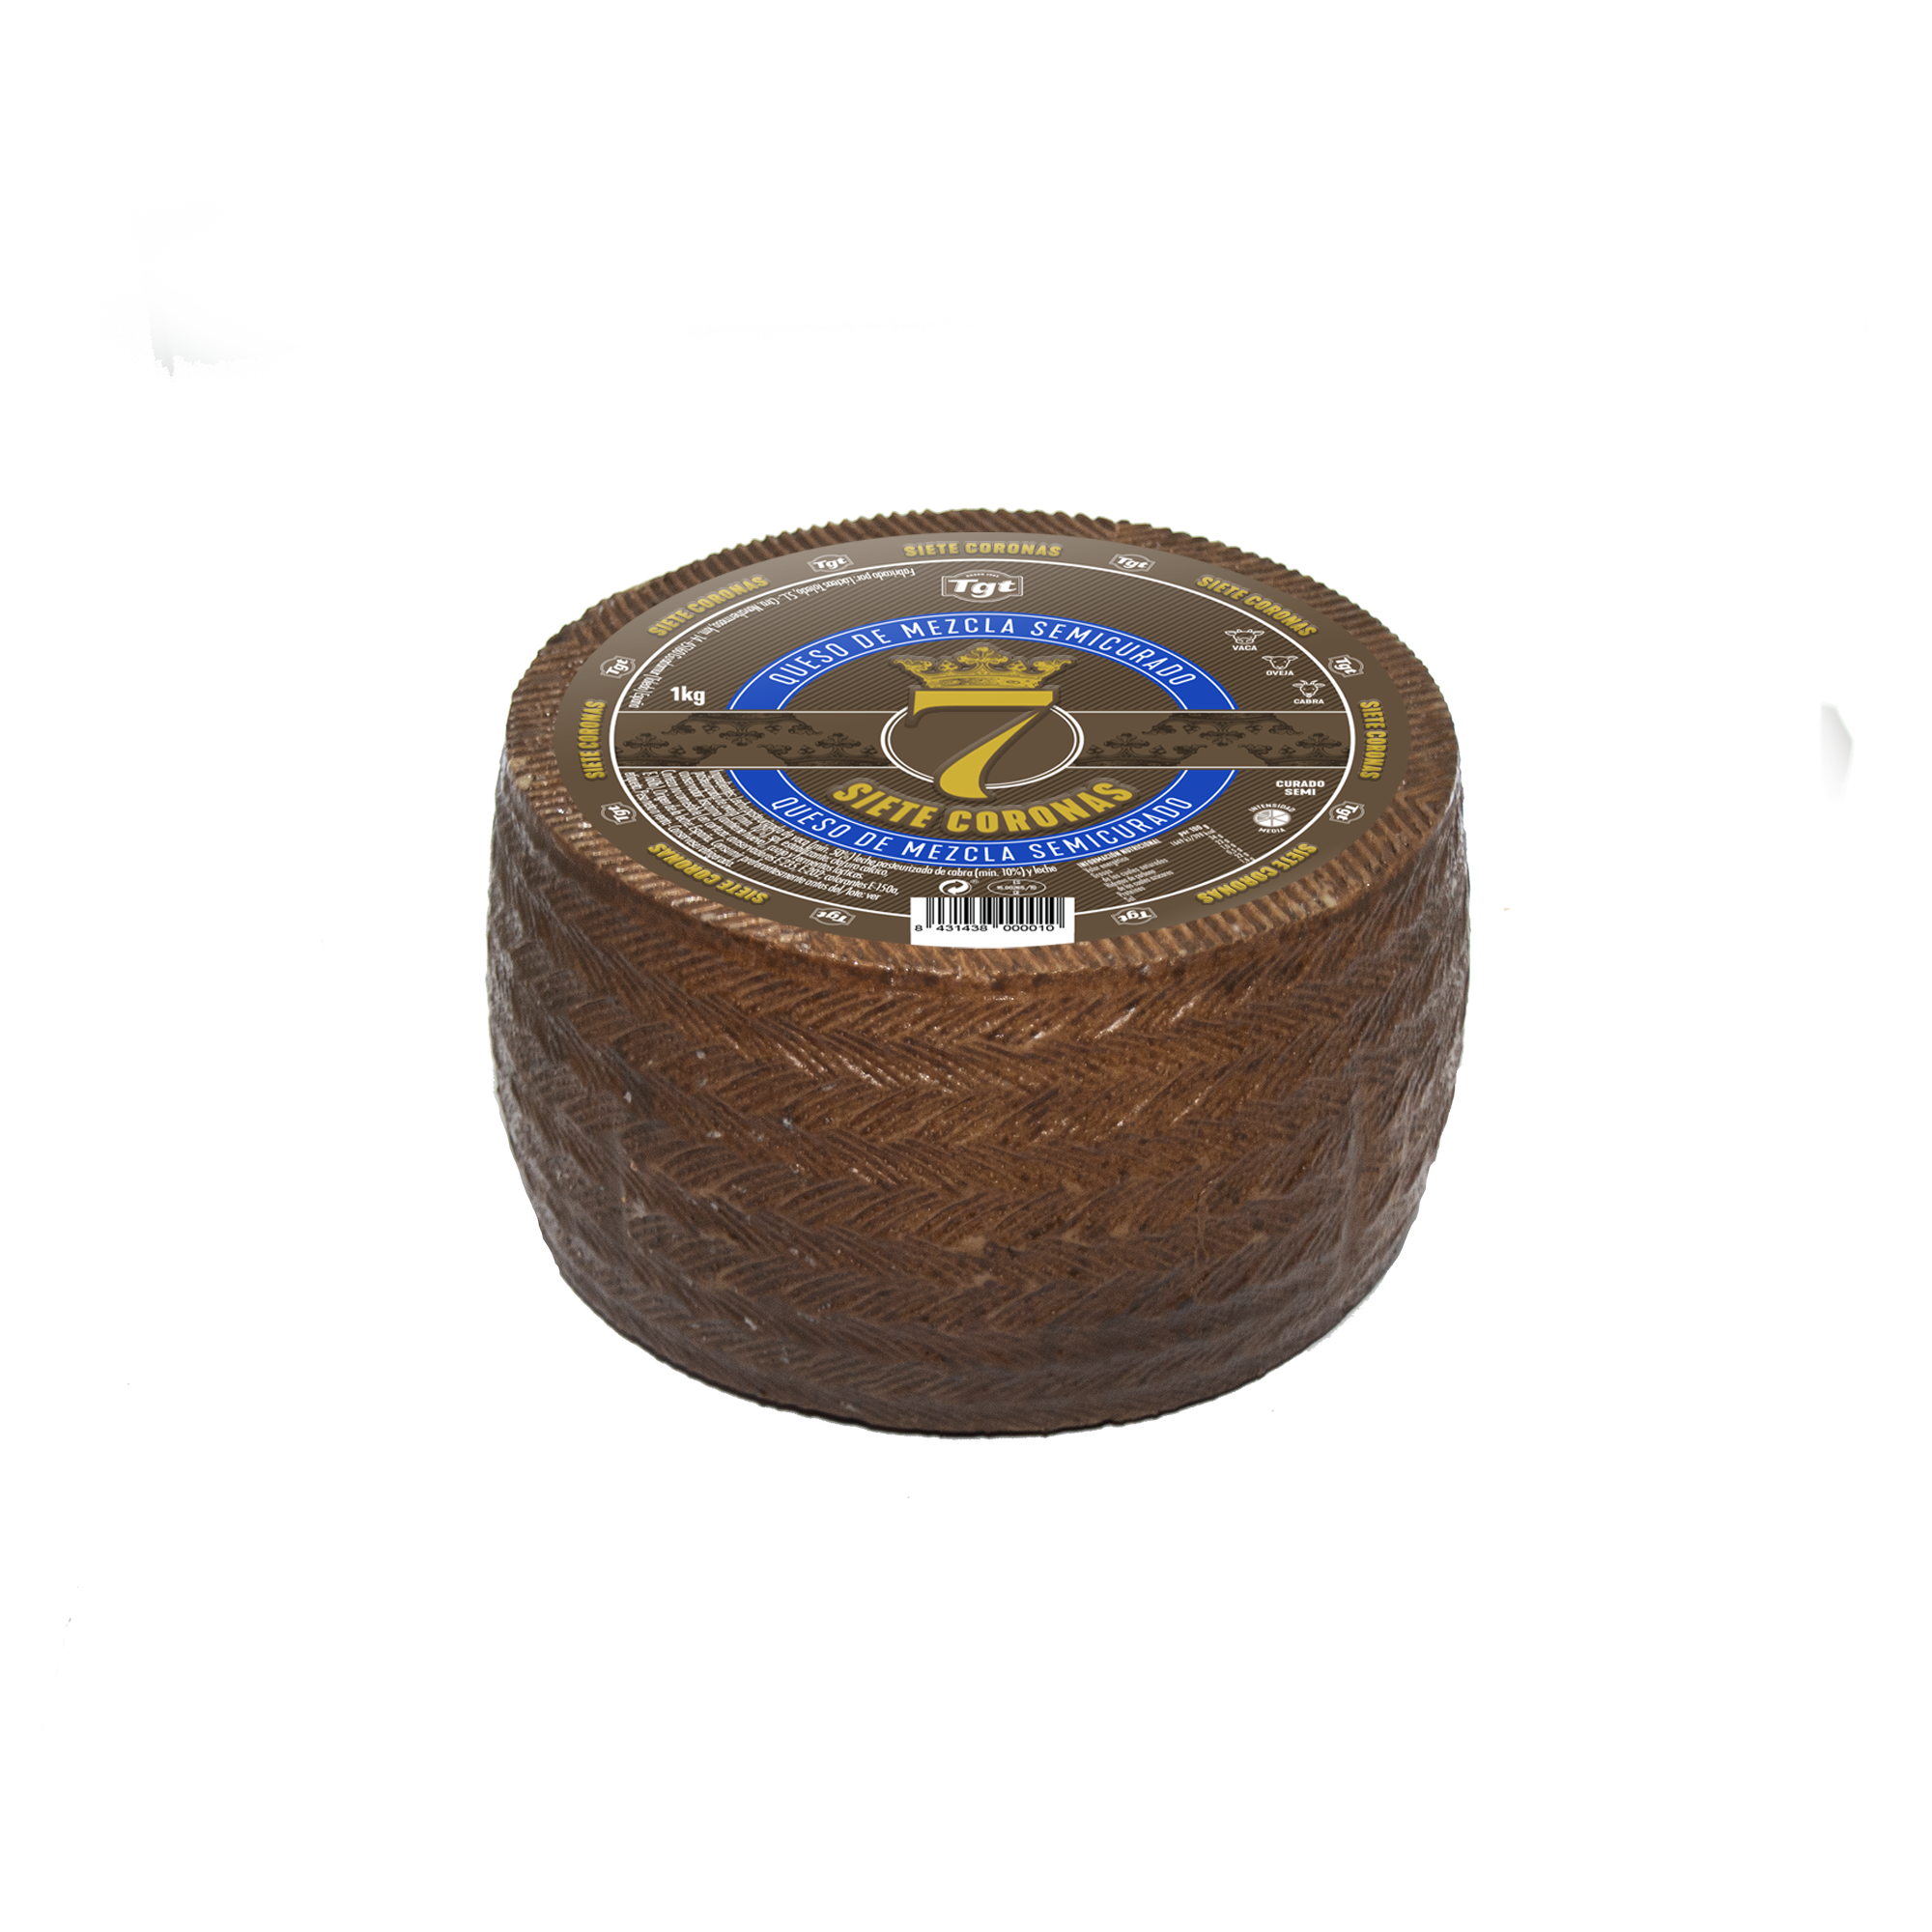 7 Coronas Semicurado Mezcla Mini